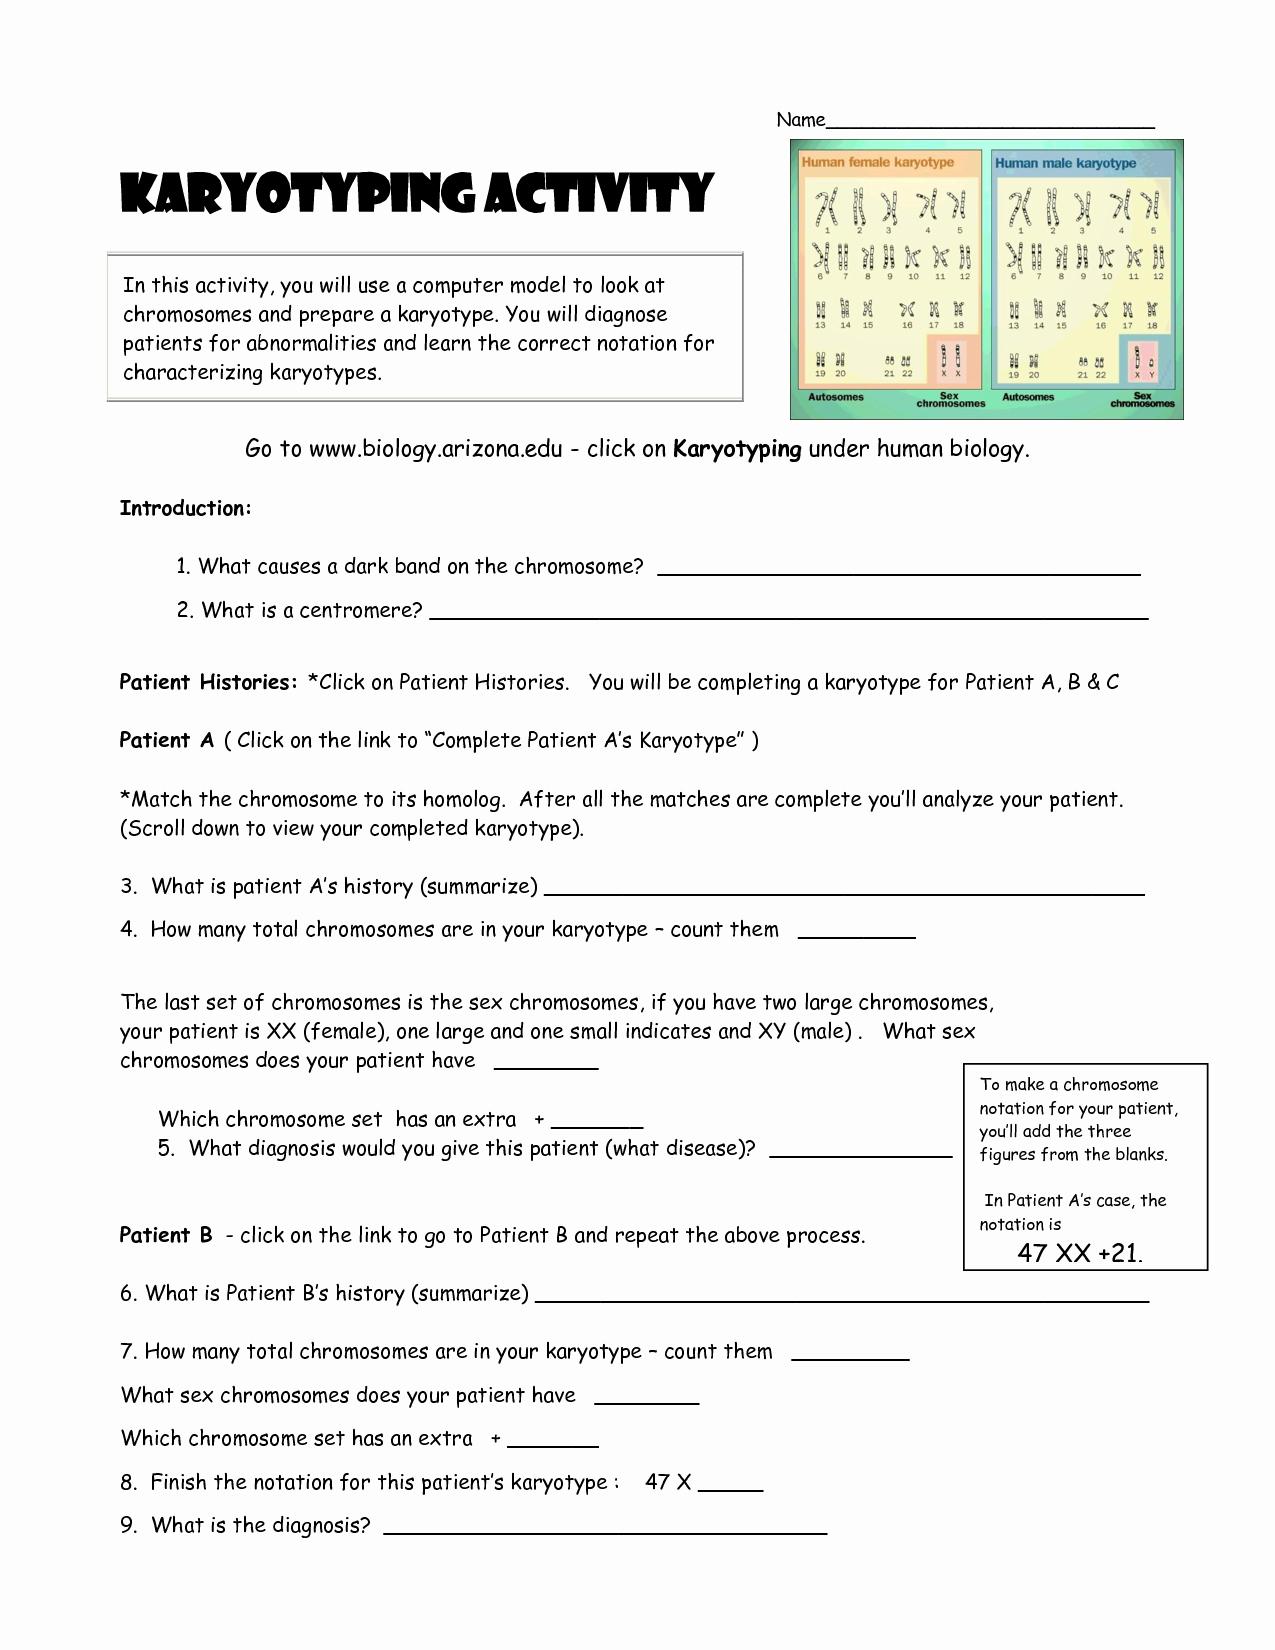 Biology Karyotype Worksheet Answers Key Lovely Karyotyping Activity Doc Teaching Stuff